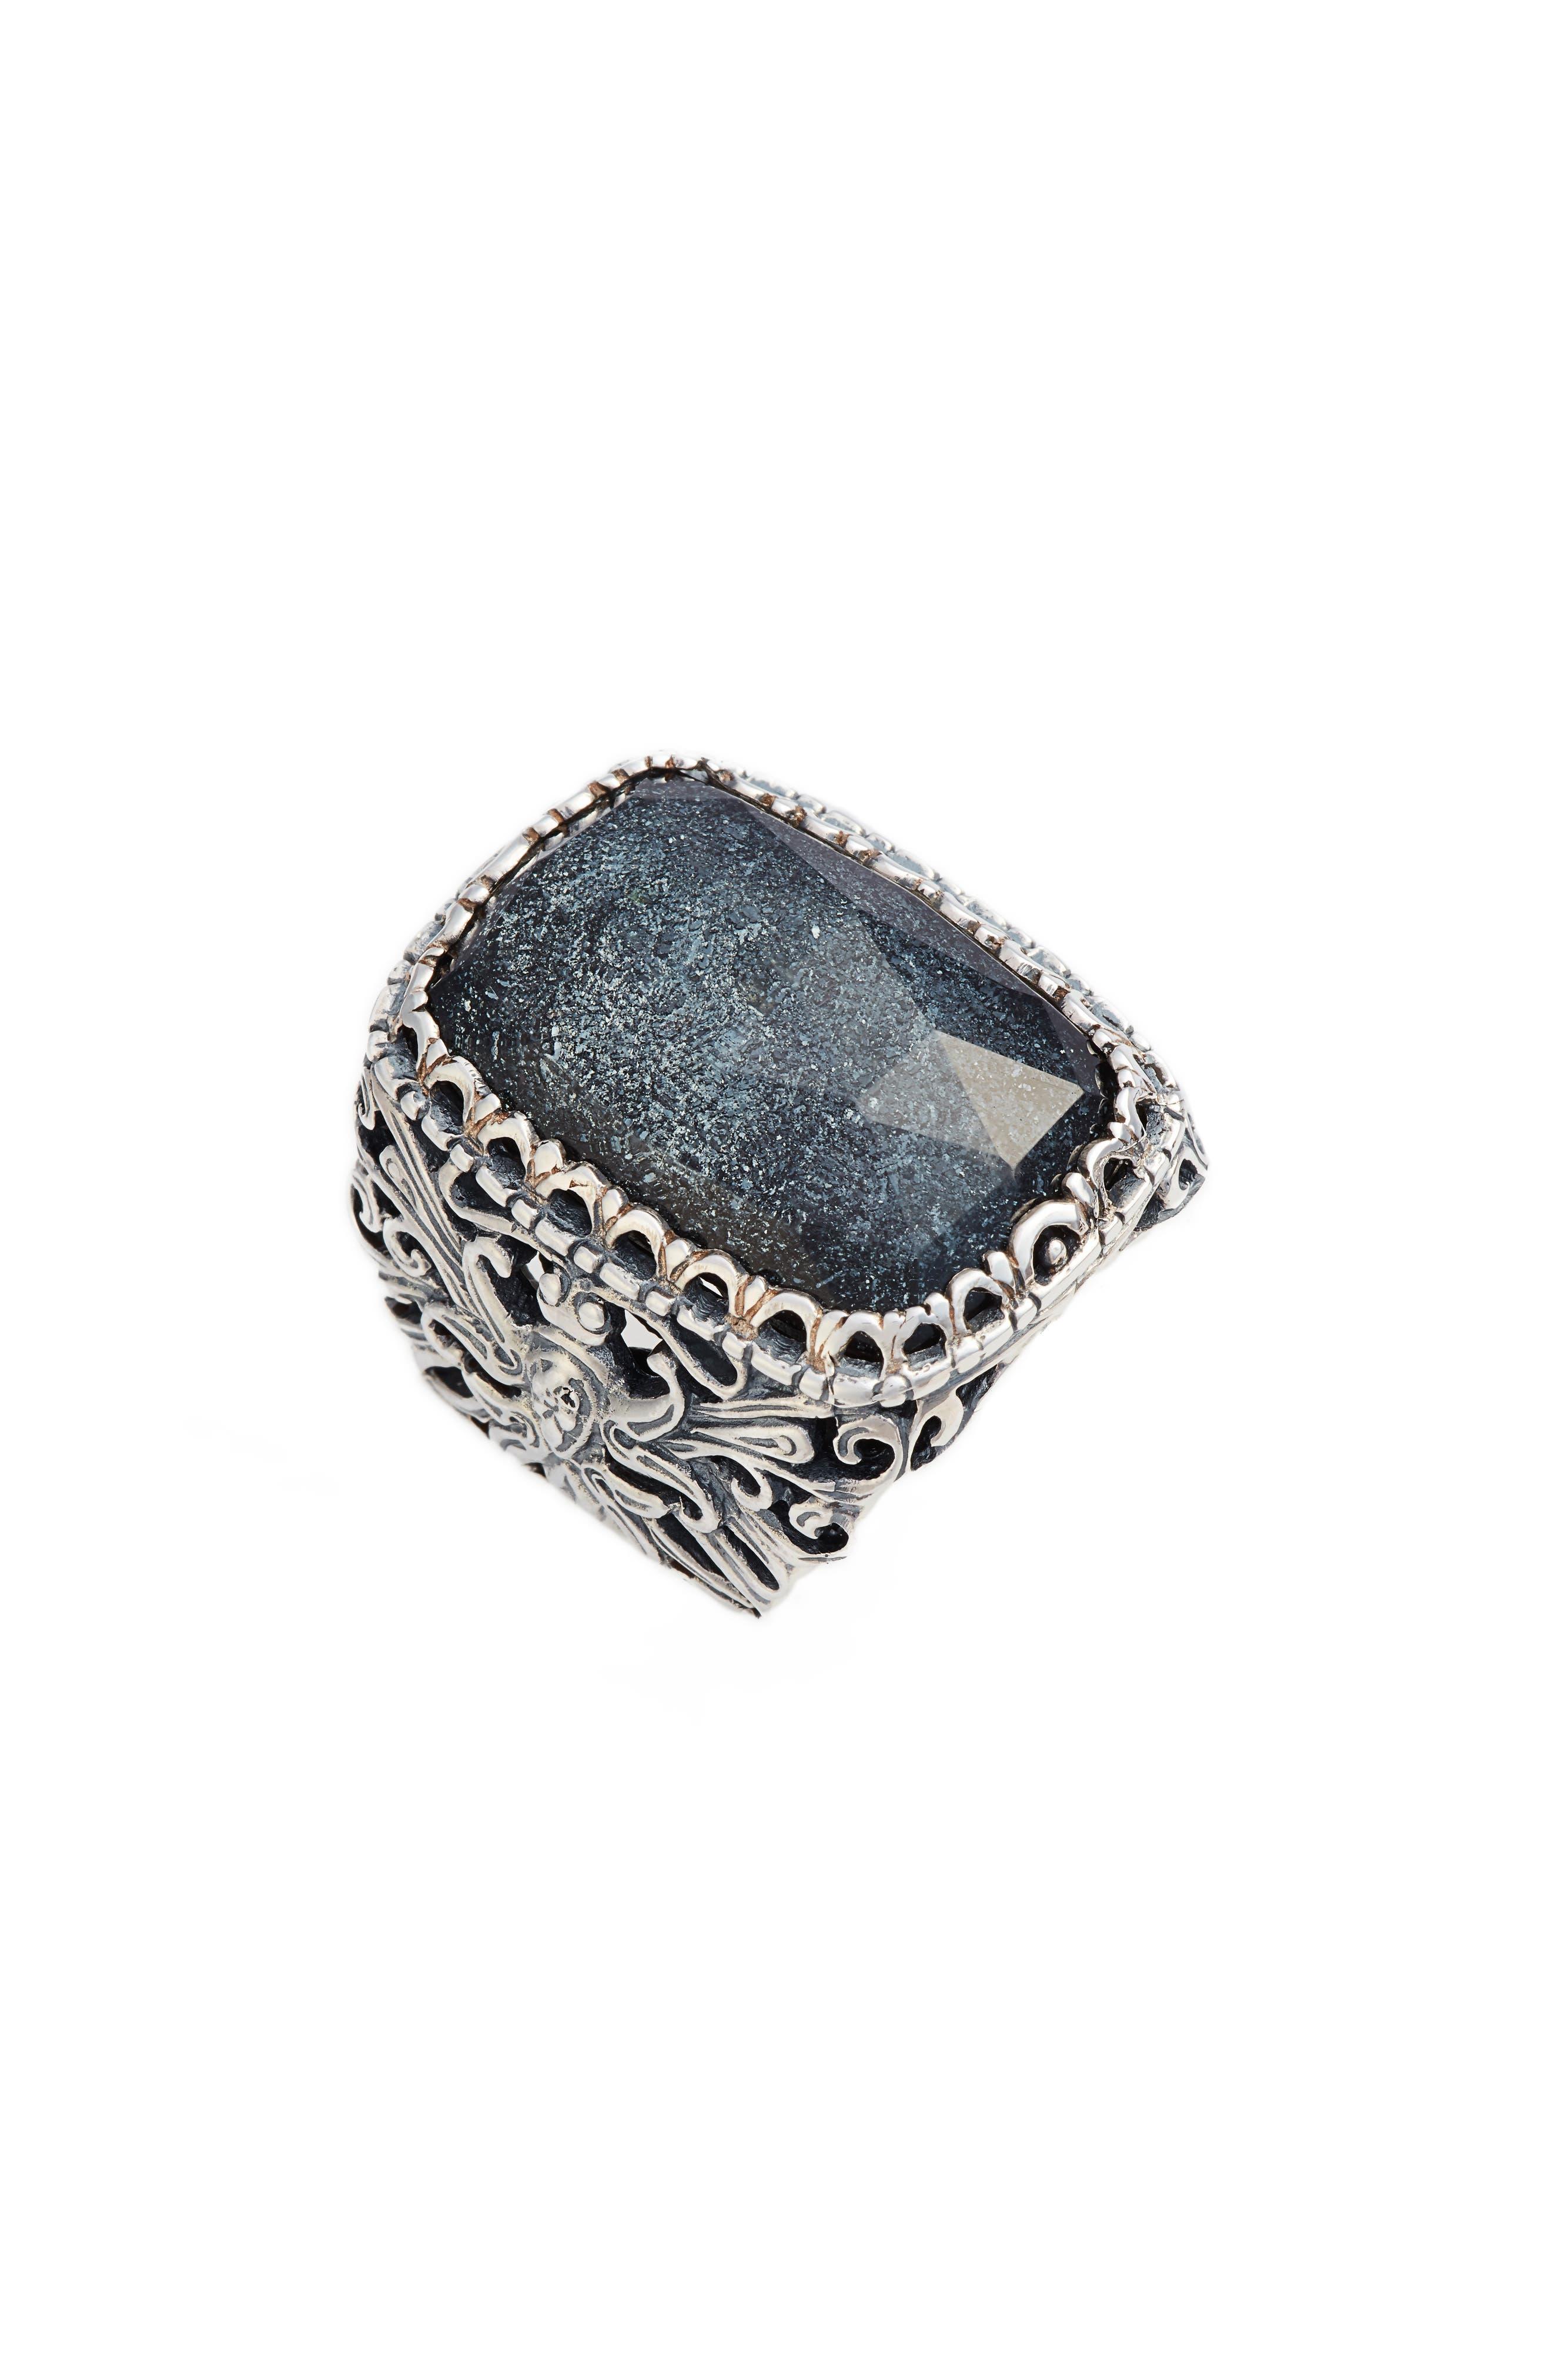 Santorini Hematite Ring,                             Main thumbnail 1, color,                             Silver/ Hematite